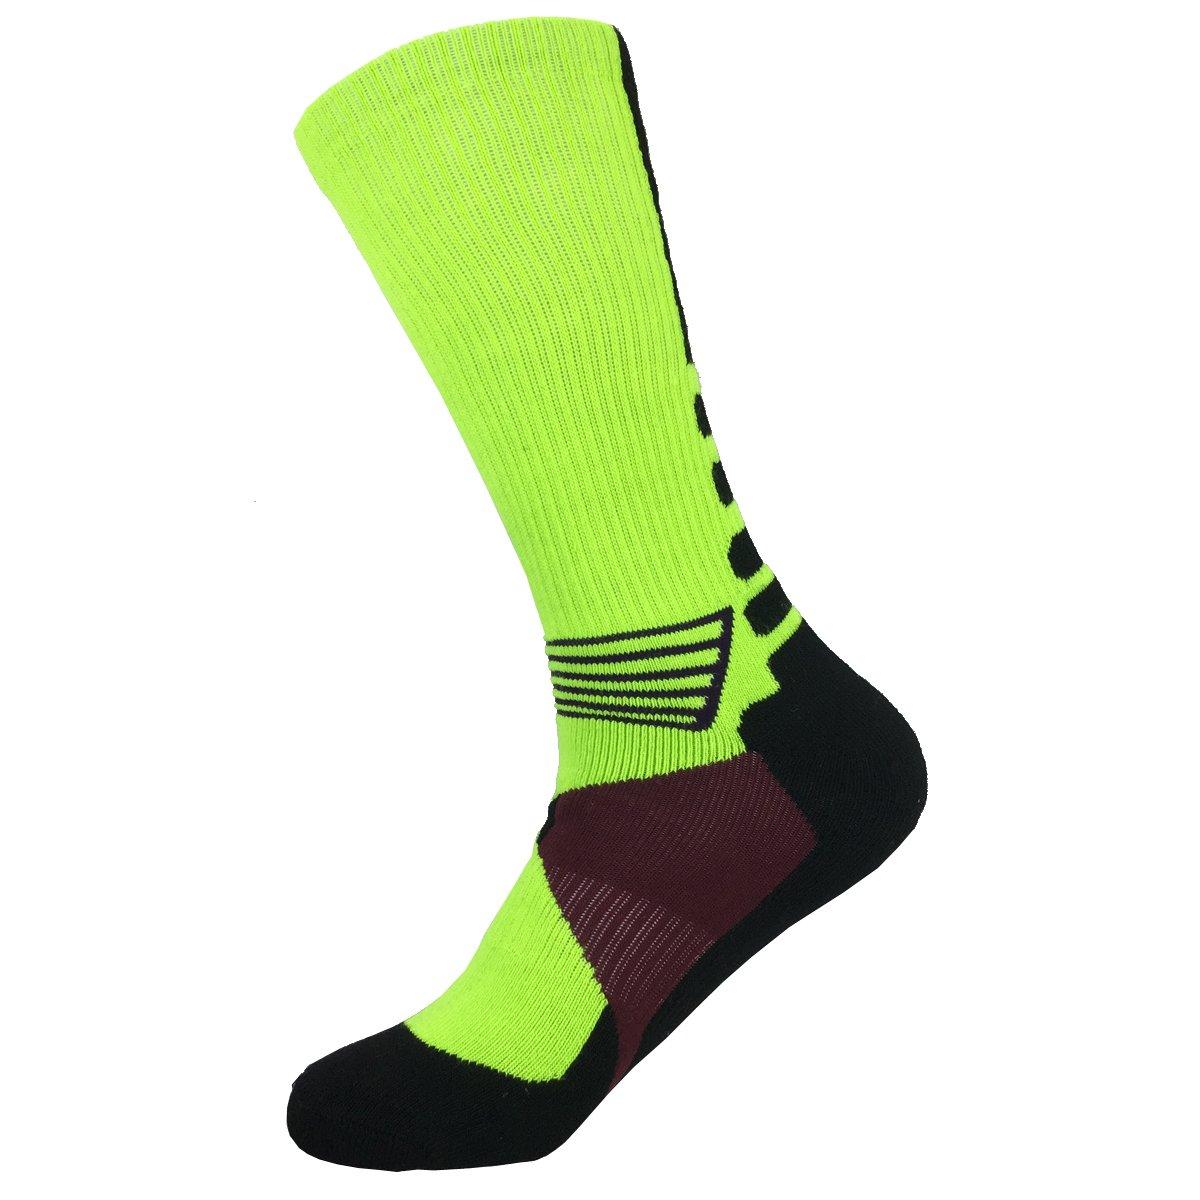 4 Pack Mens Sport Crew Sock Basketball Cushioned Dri-Fit Athletic Long Compression Socks